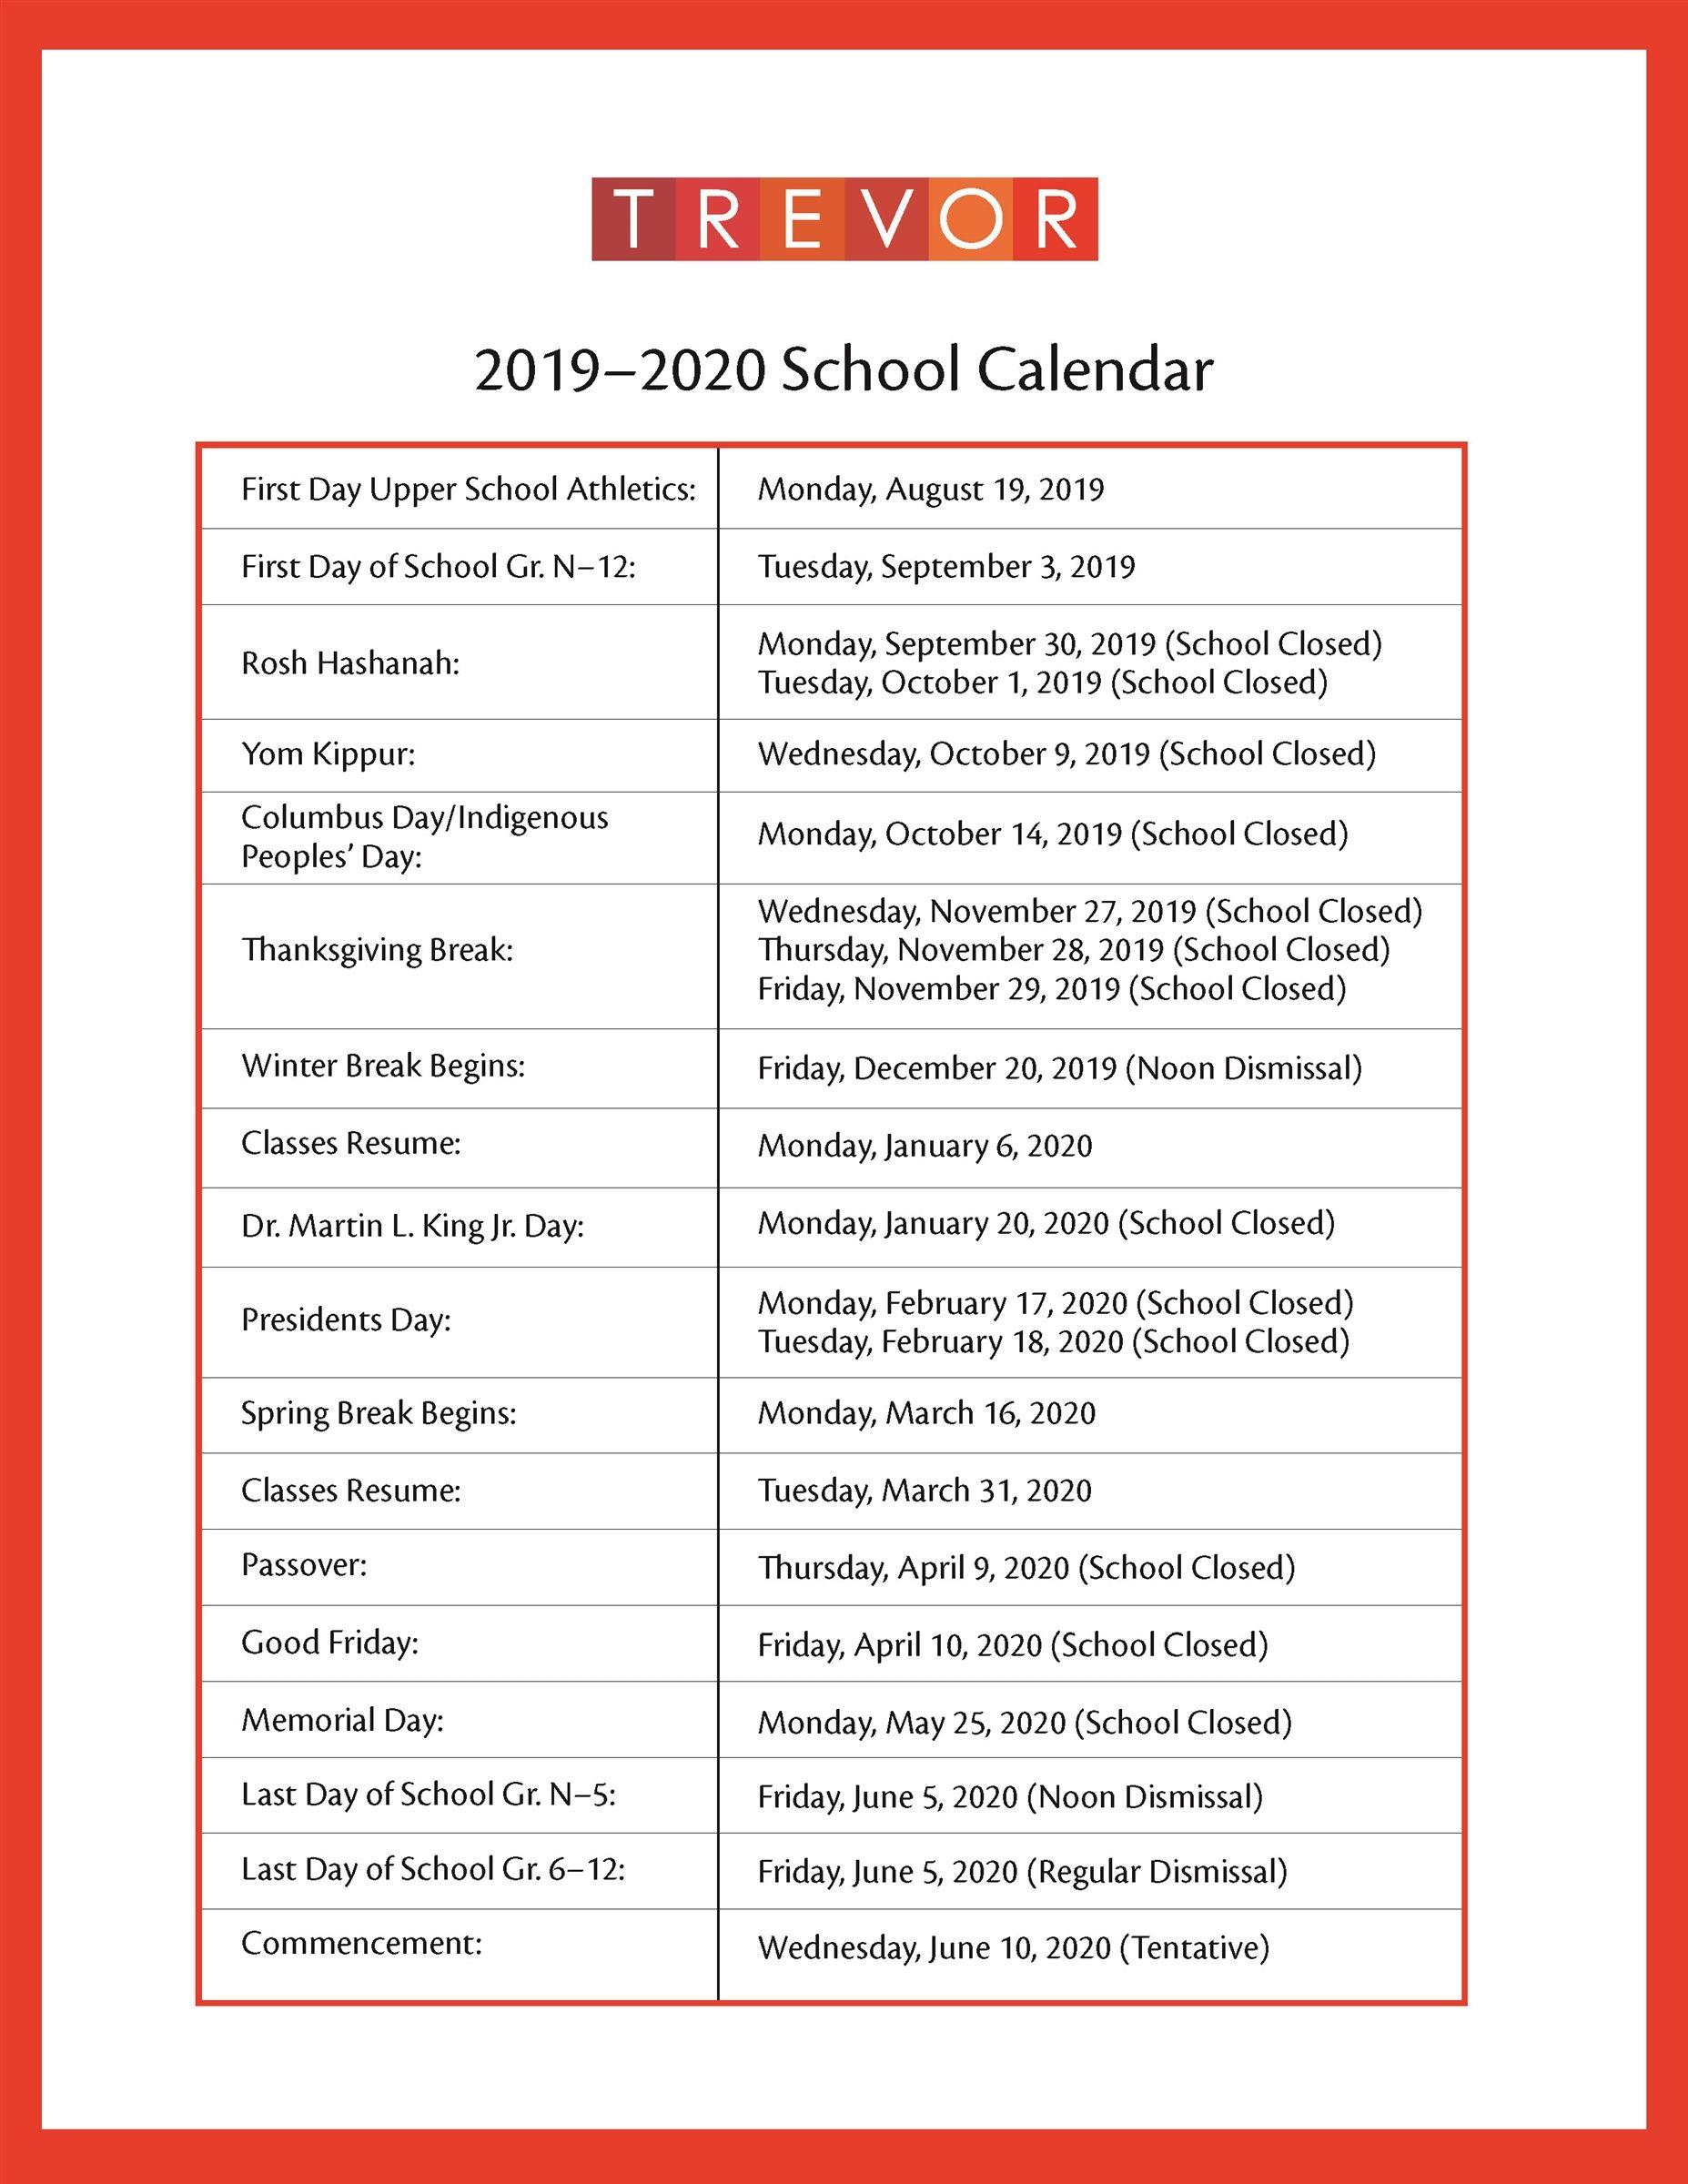 Nyu Academic Calendar 2020-2021 2019 2020 Academic Calendar